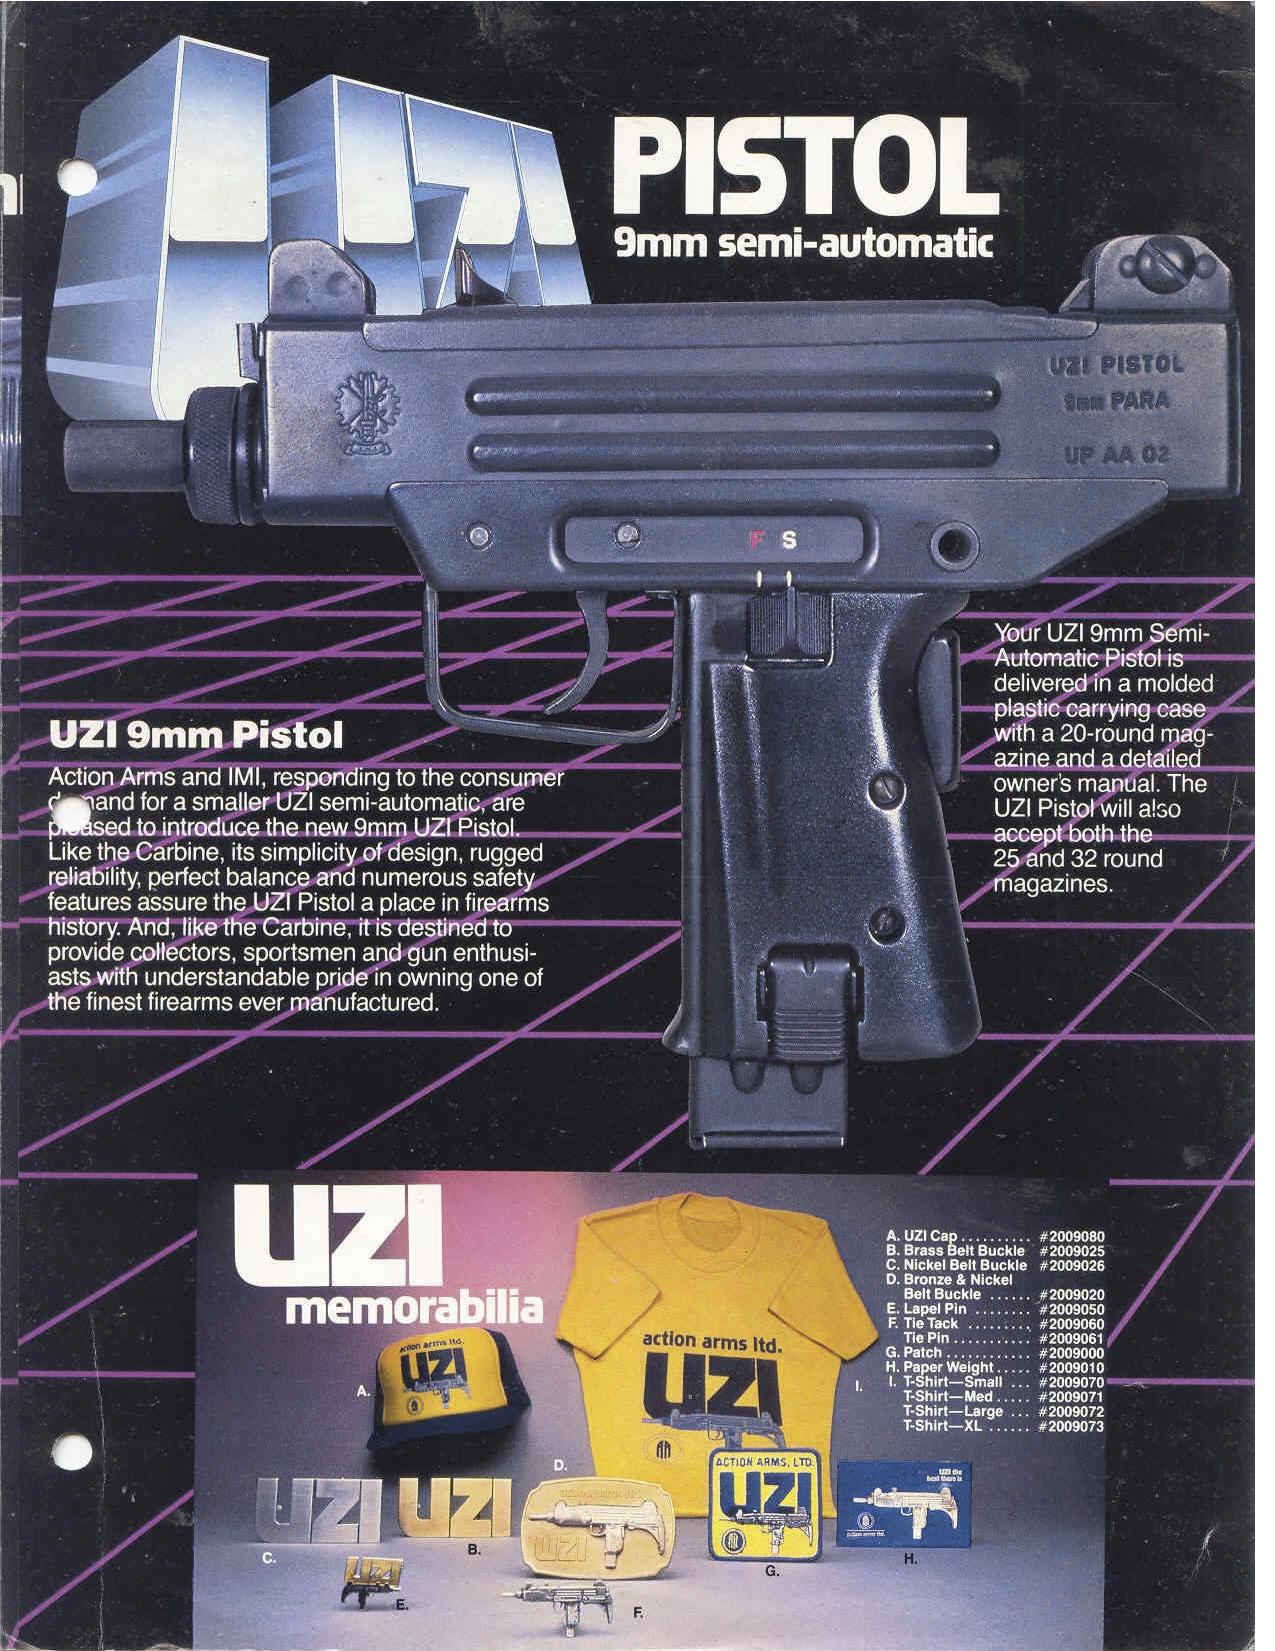 Uzi advertisement from 1986 : outrun